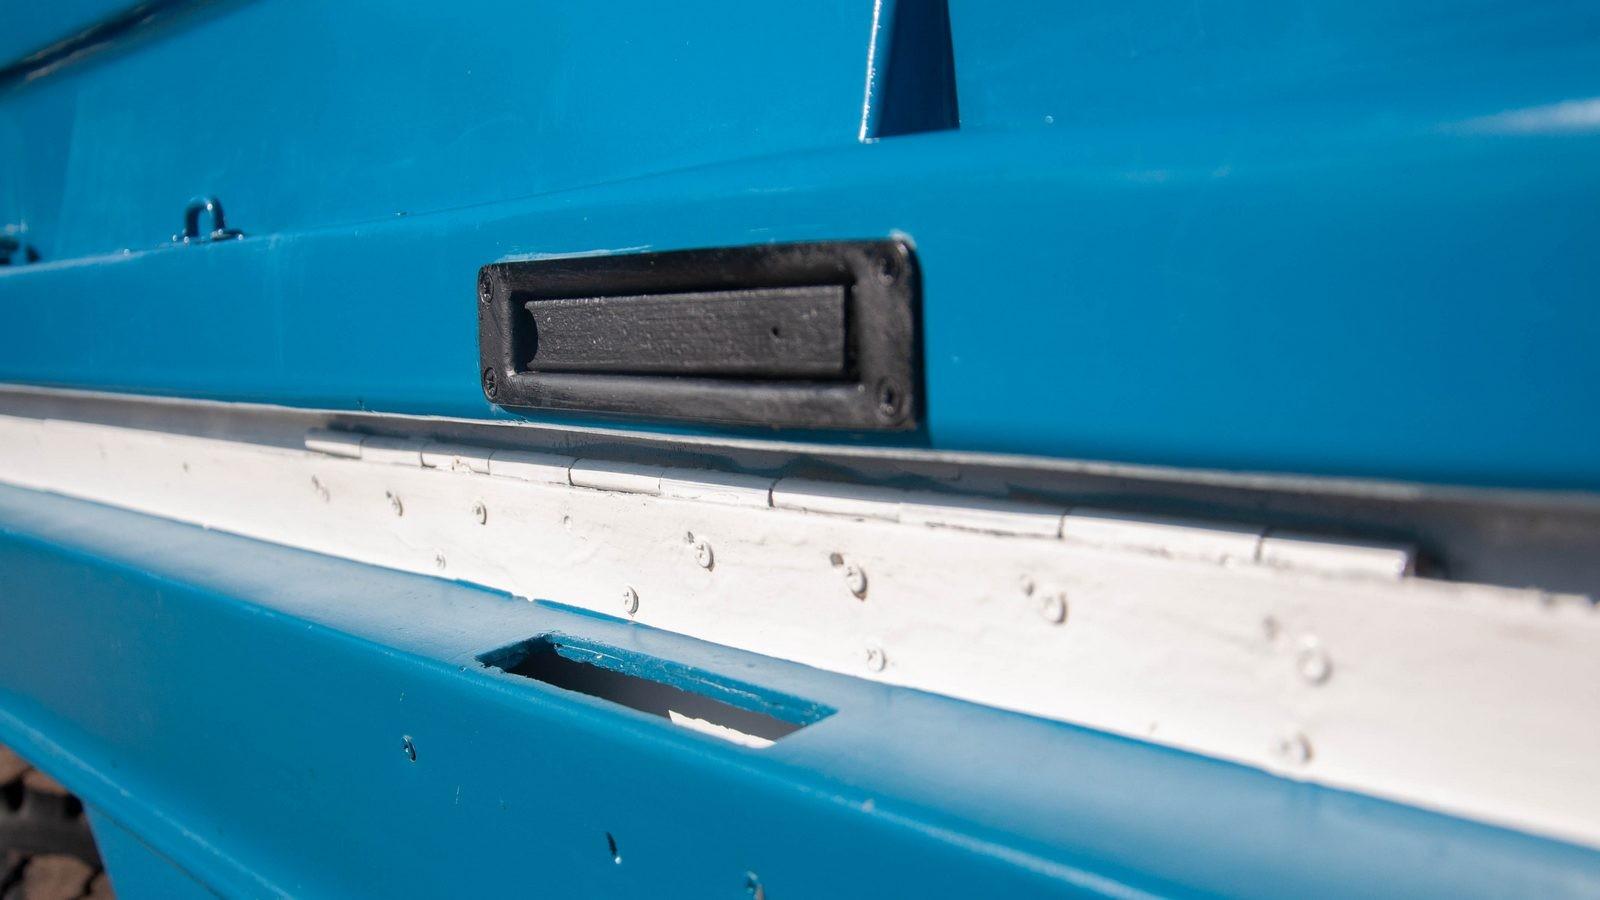 ЗИЛ-49061 Синяя Птица борт